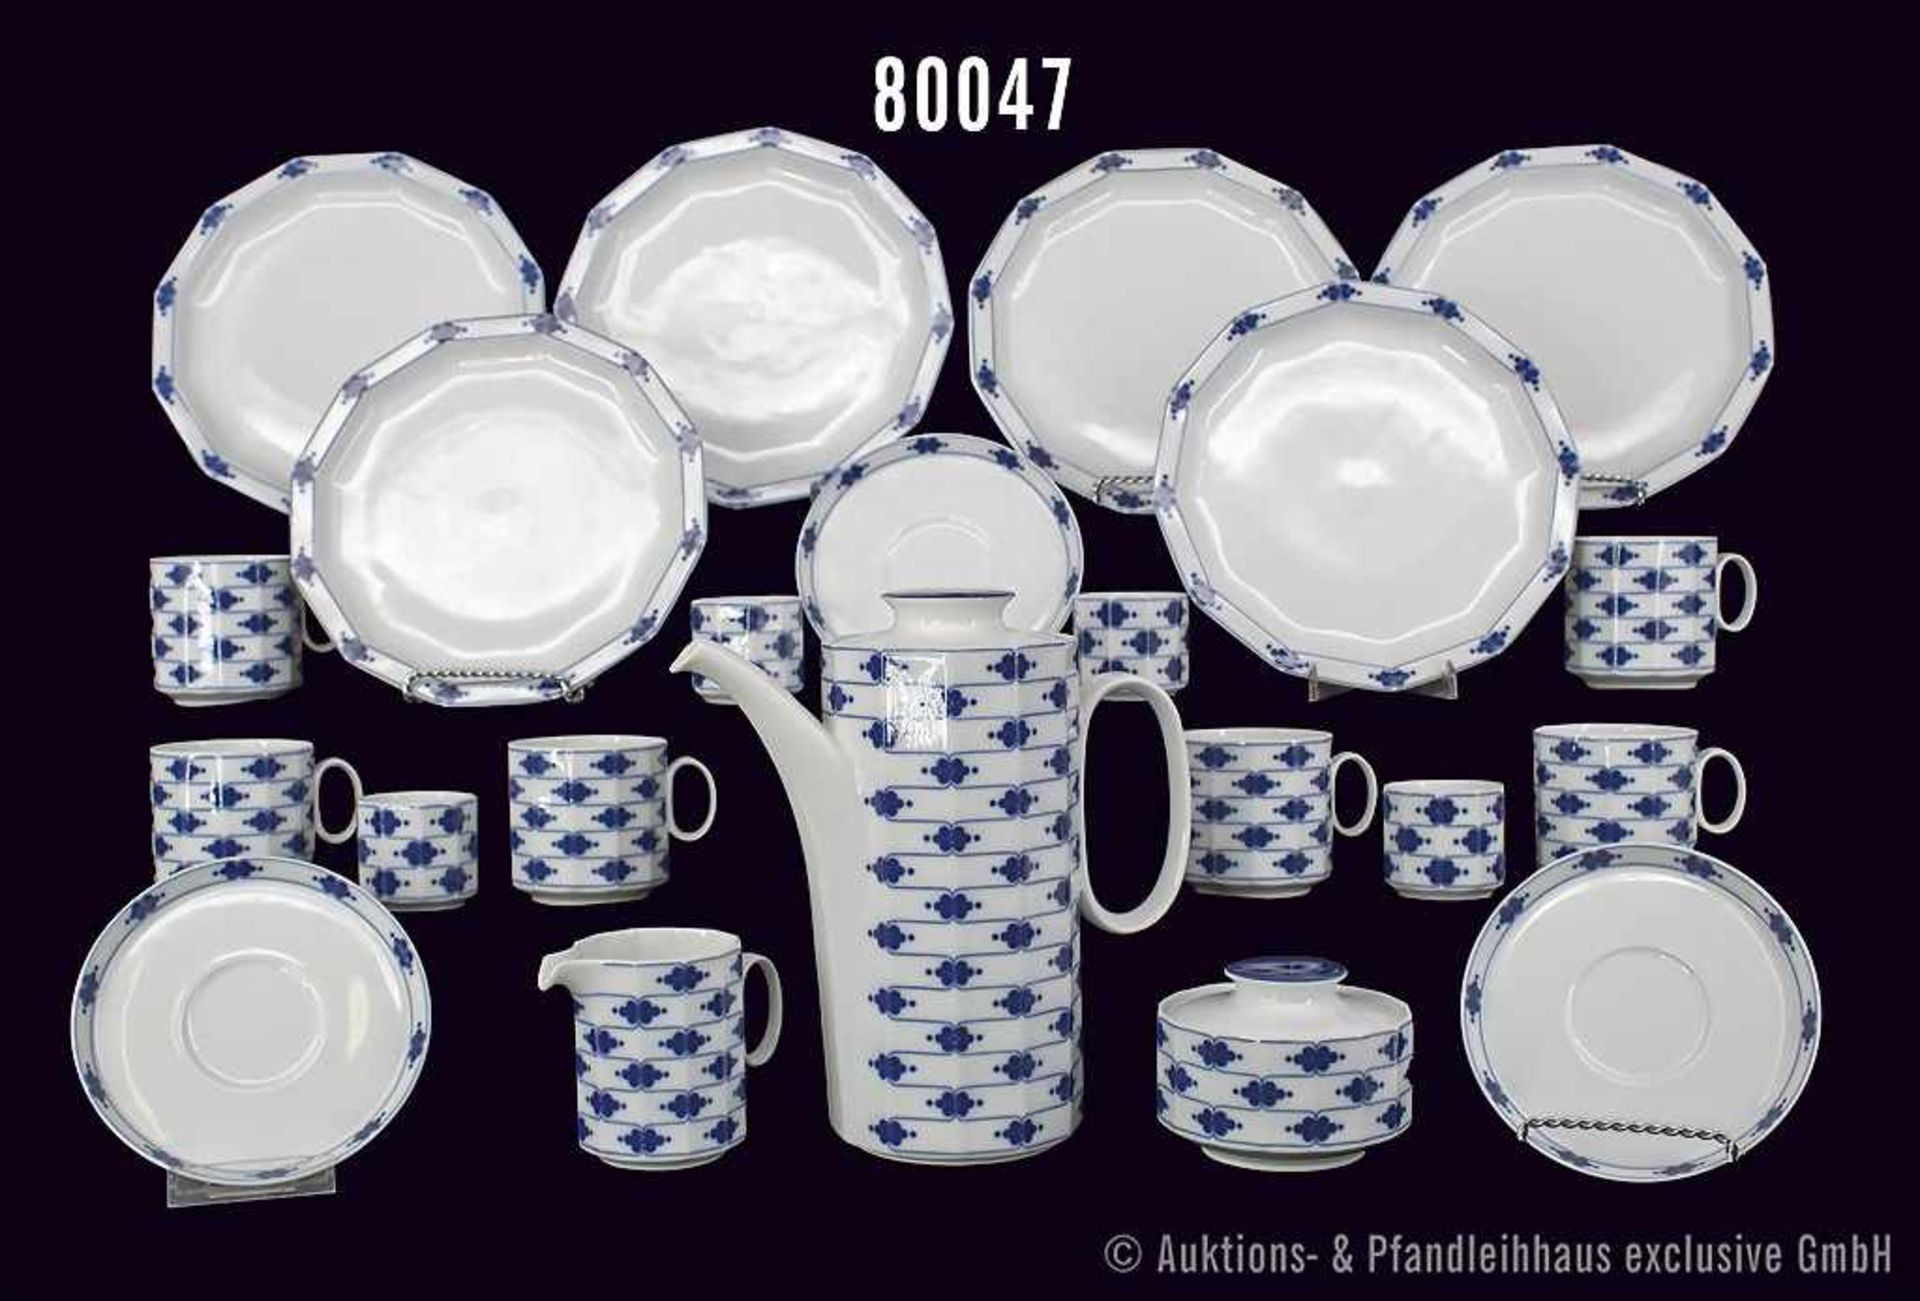 Konv. Rosenthal Porzellan, 27 Teile, Rosenthal studio-linie, Serie Polygon, Dekor Korinth, blaue